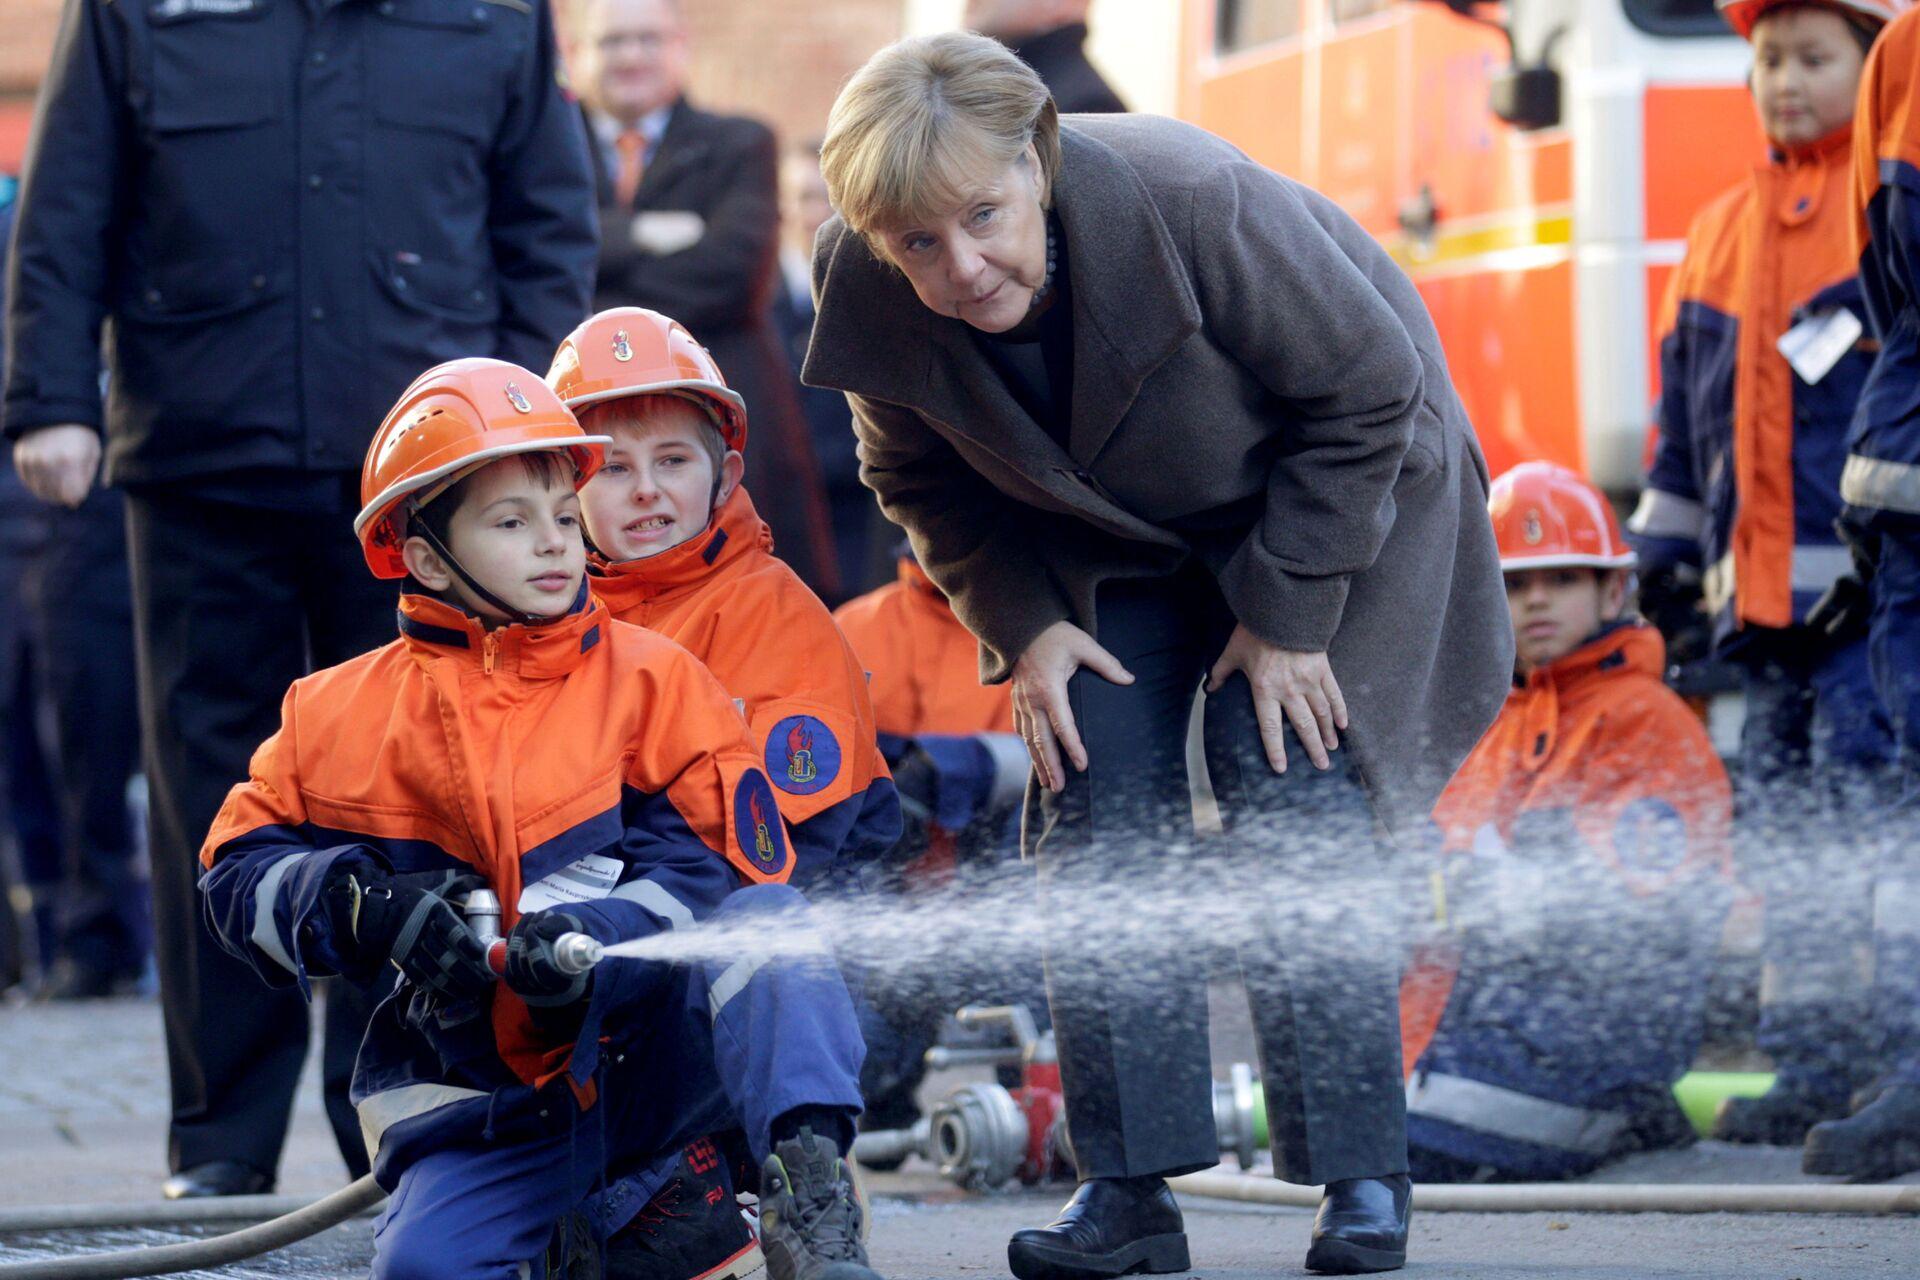 Angela Merkel con due piccoli vigili del fuoco - Sputnik Italia, 1920, 11.10.2021